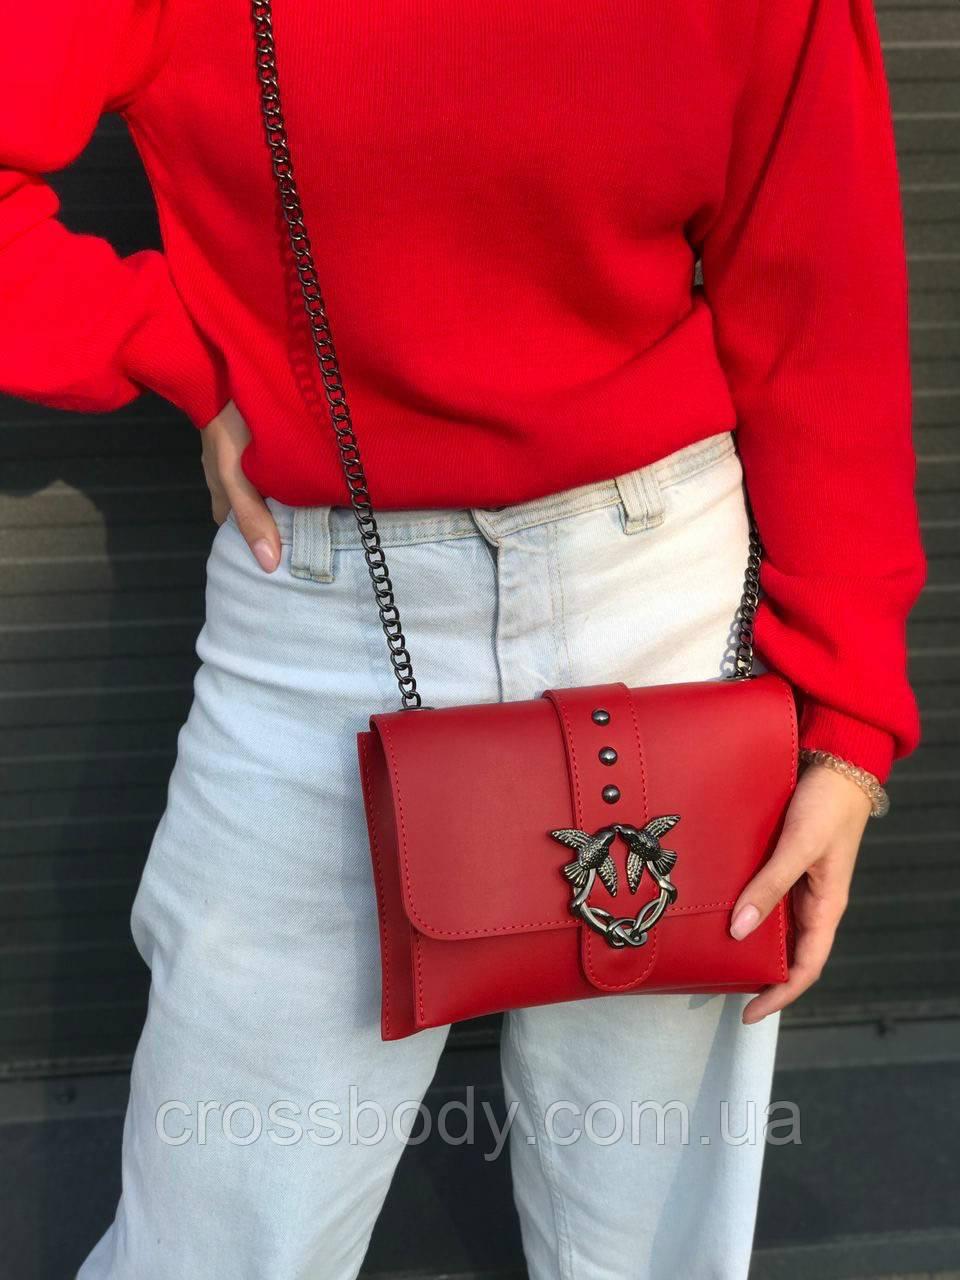 Gucci bags 23x17 чёрный красный желтый пудра бутылка рыжий